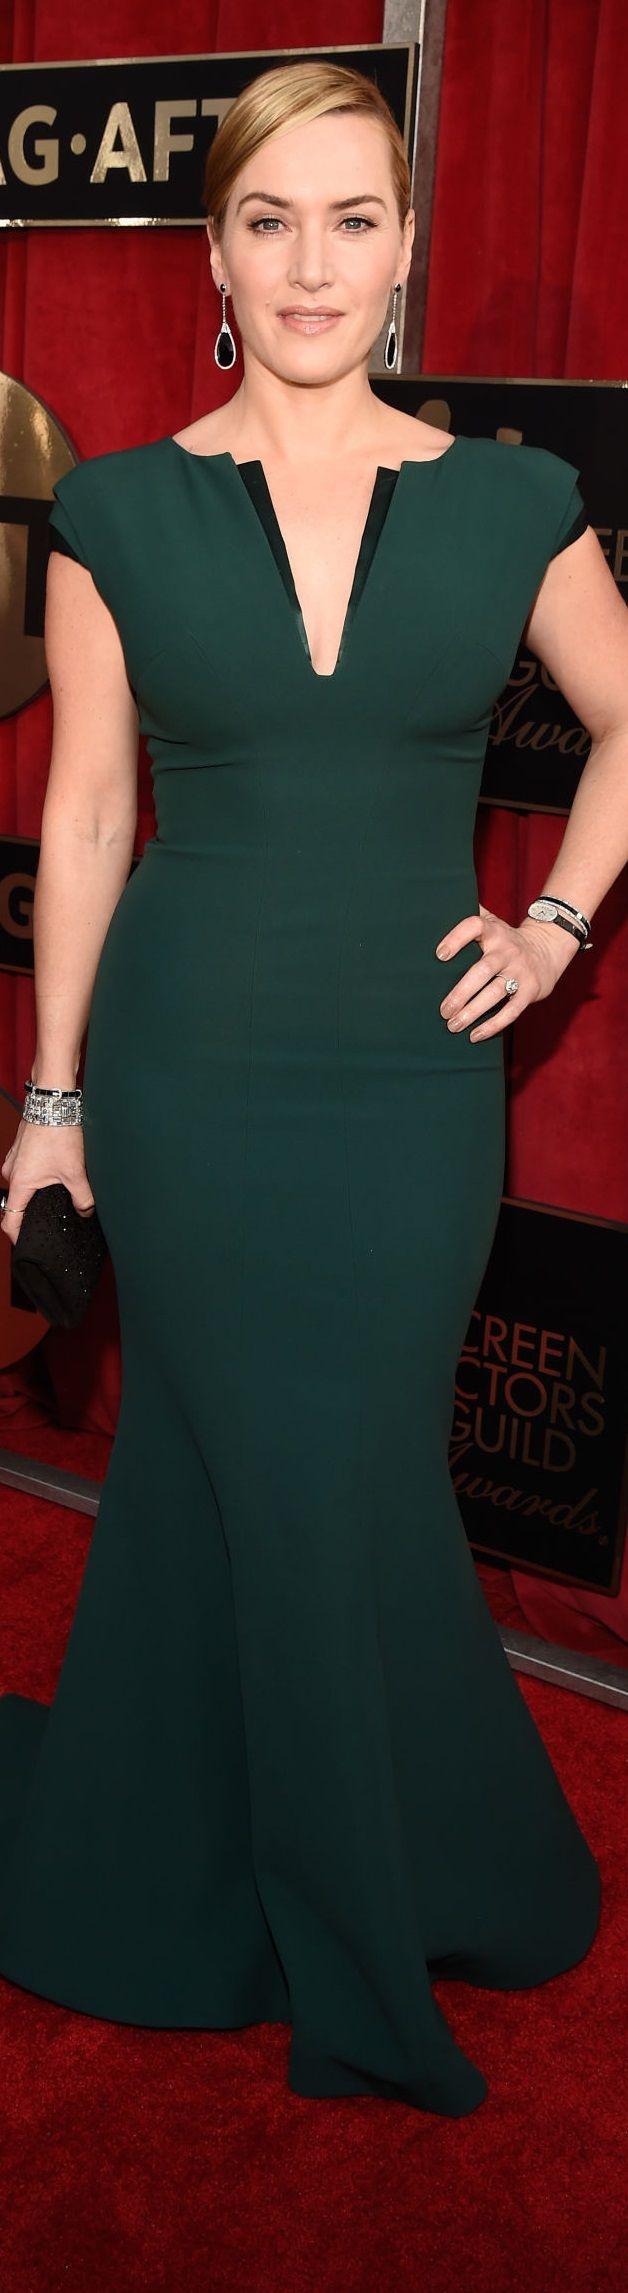 Kate Winslet Body 2016